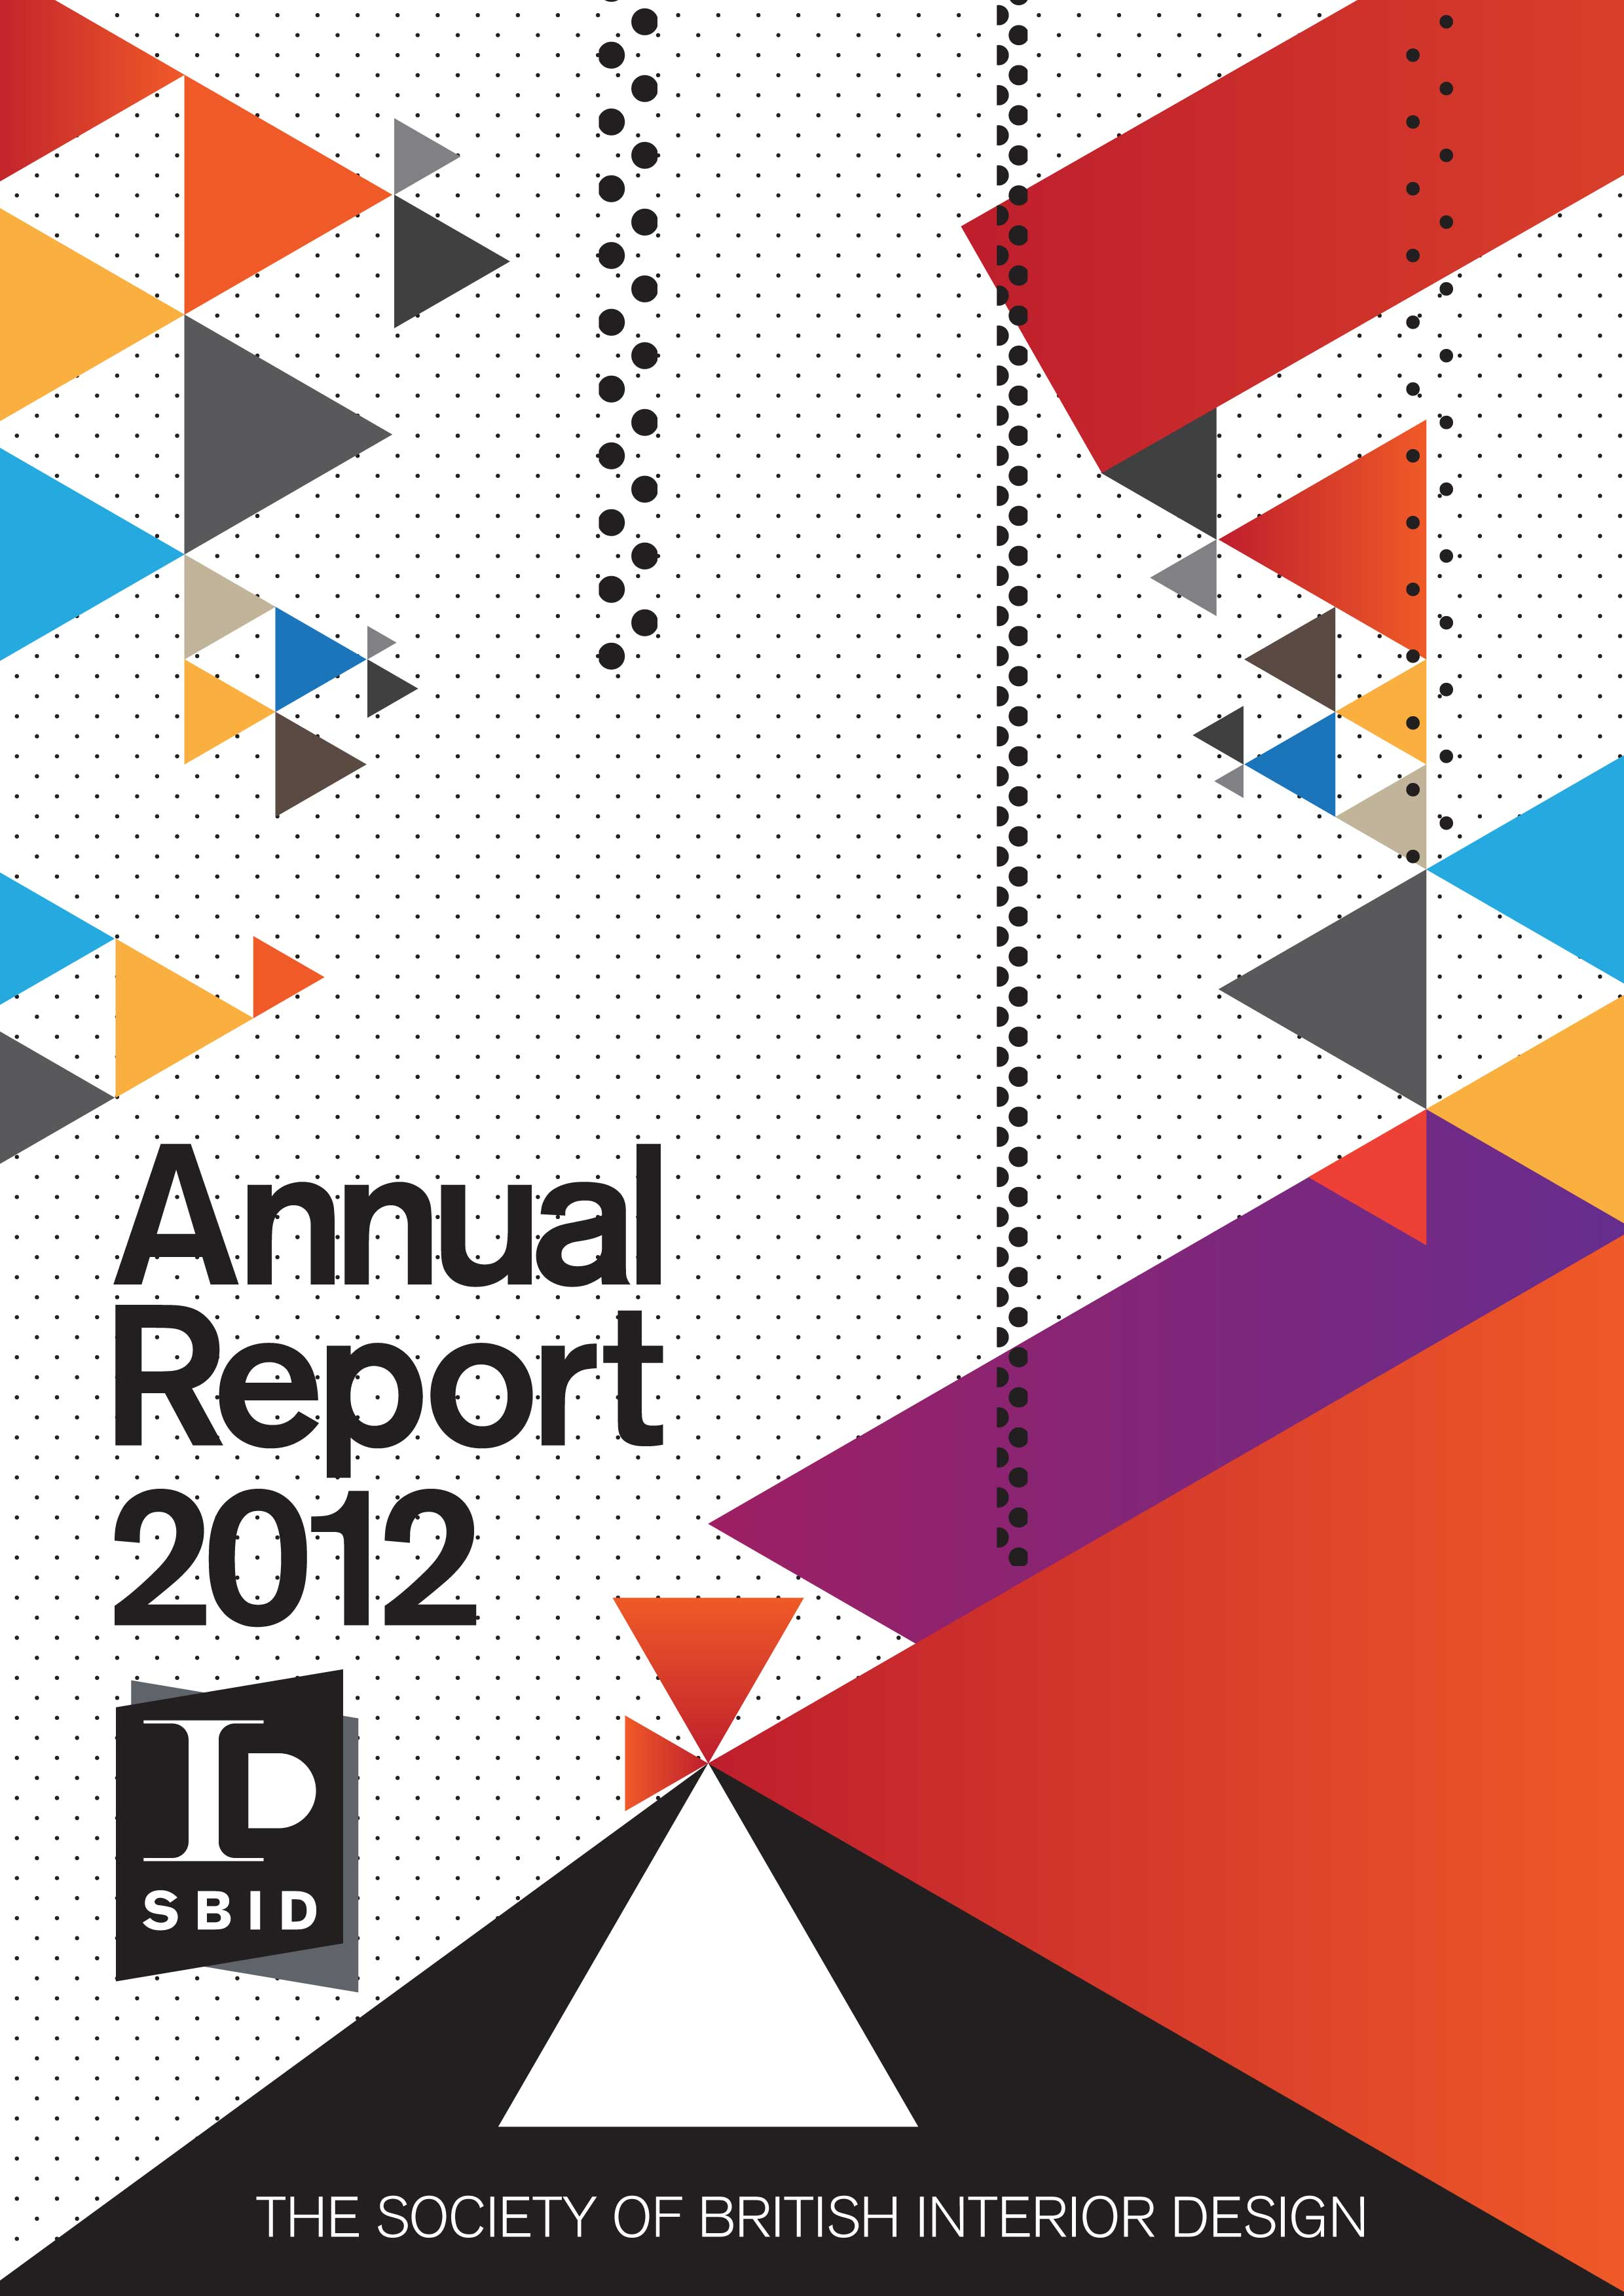 Annual-Report-2012-1